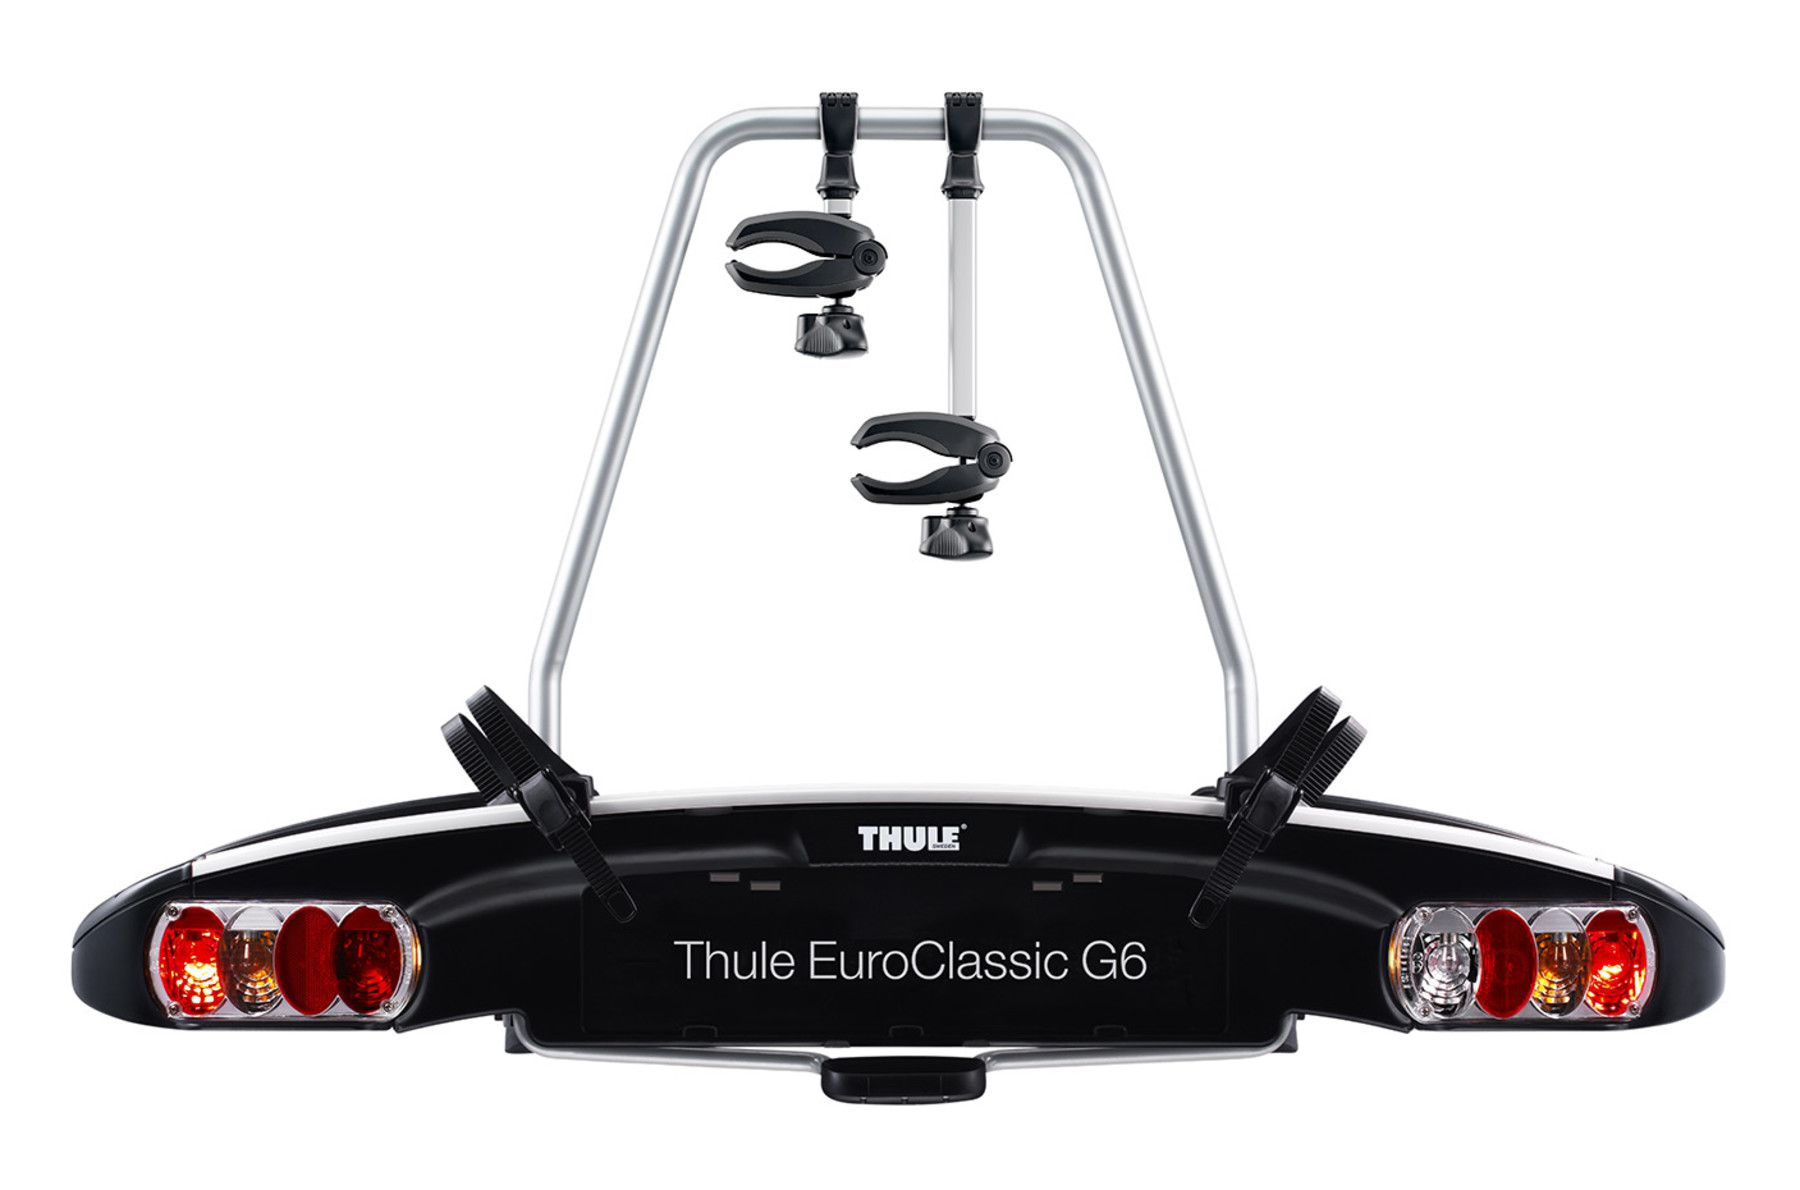 Thule EuroClassic G6 2